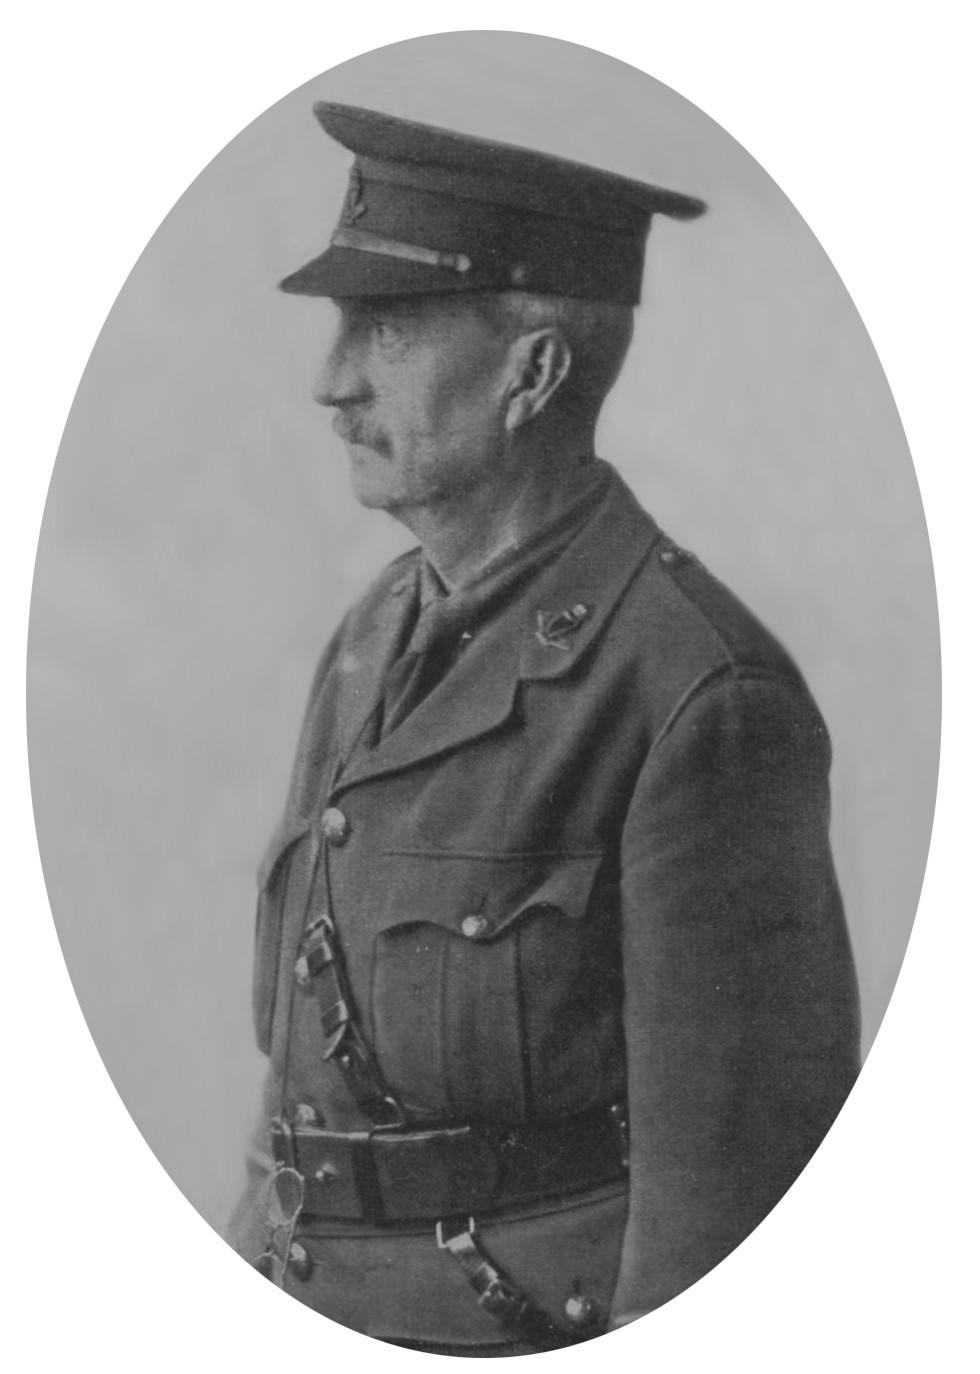 Major William Redmond